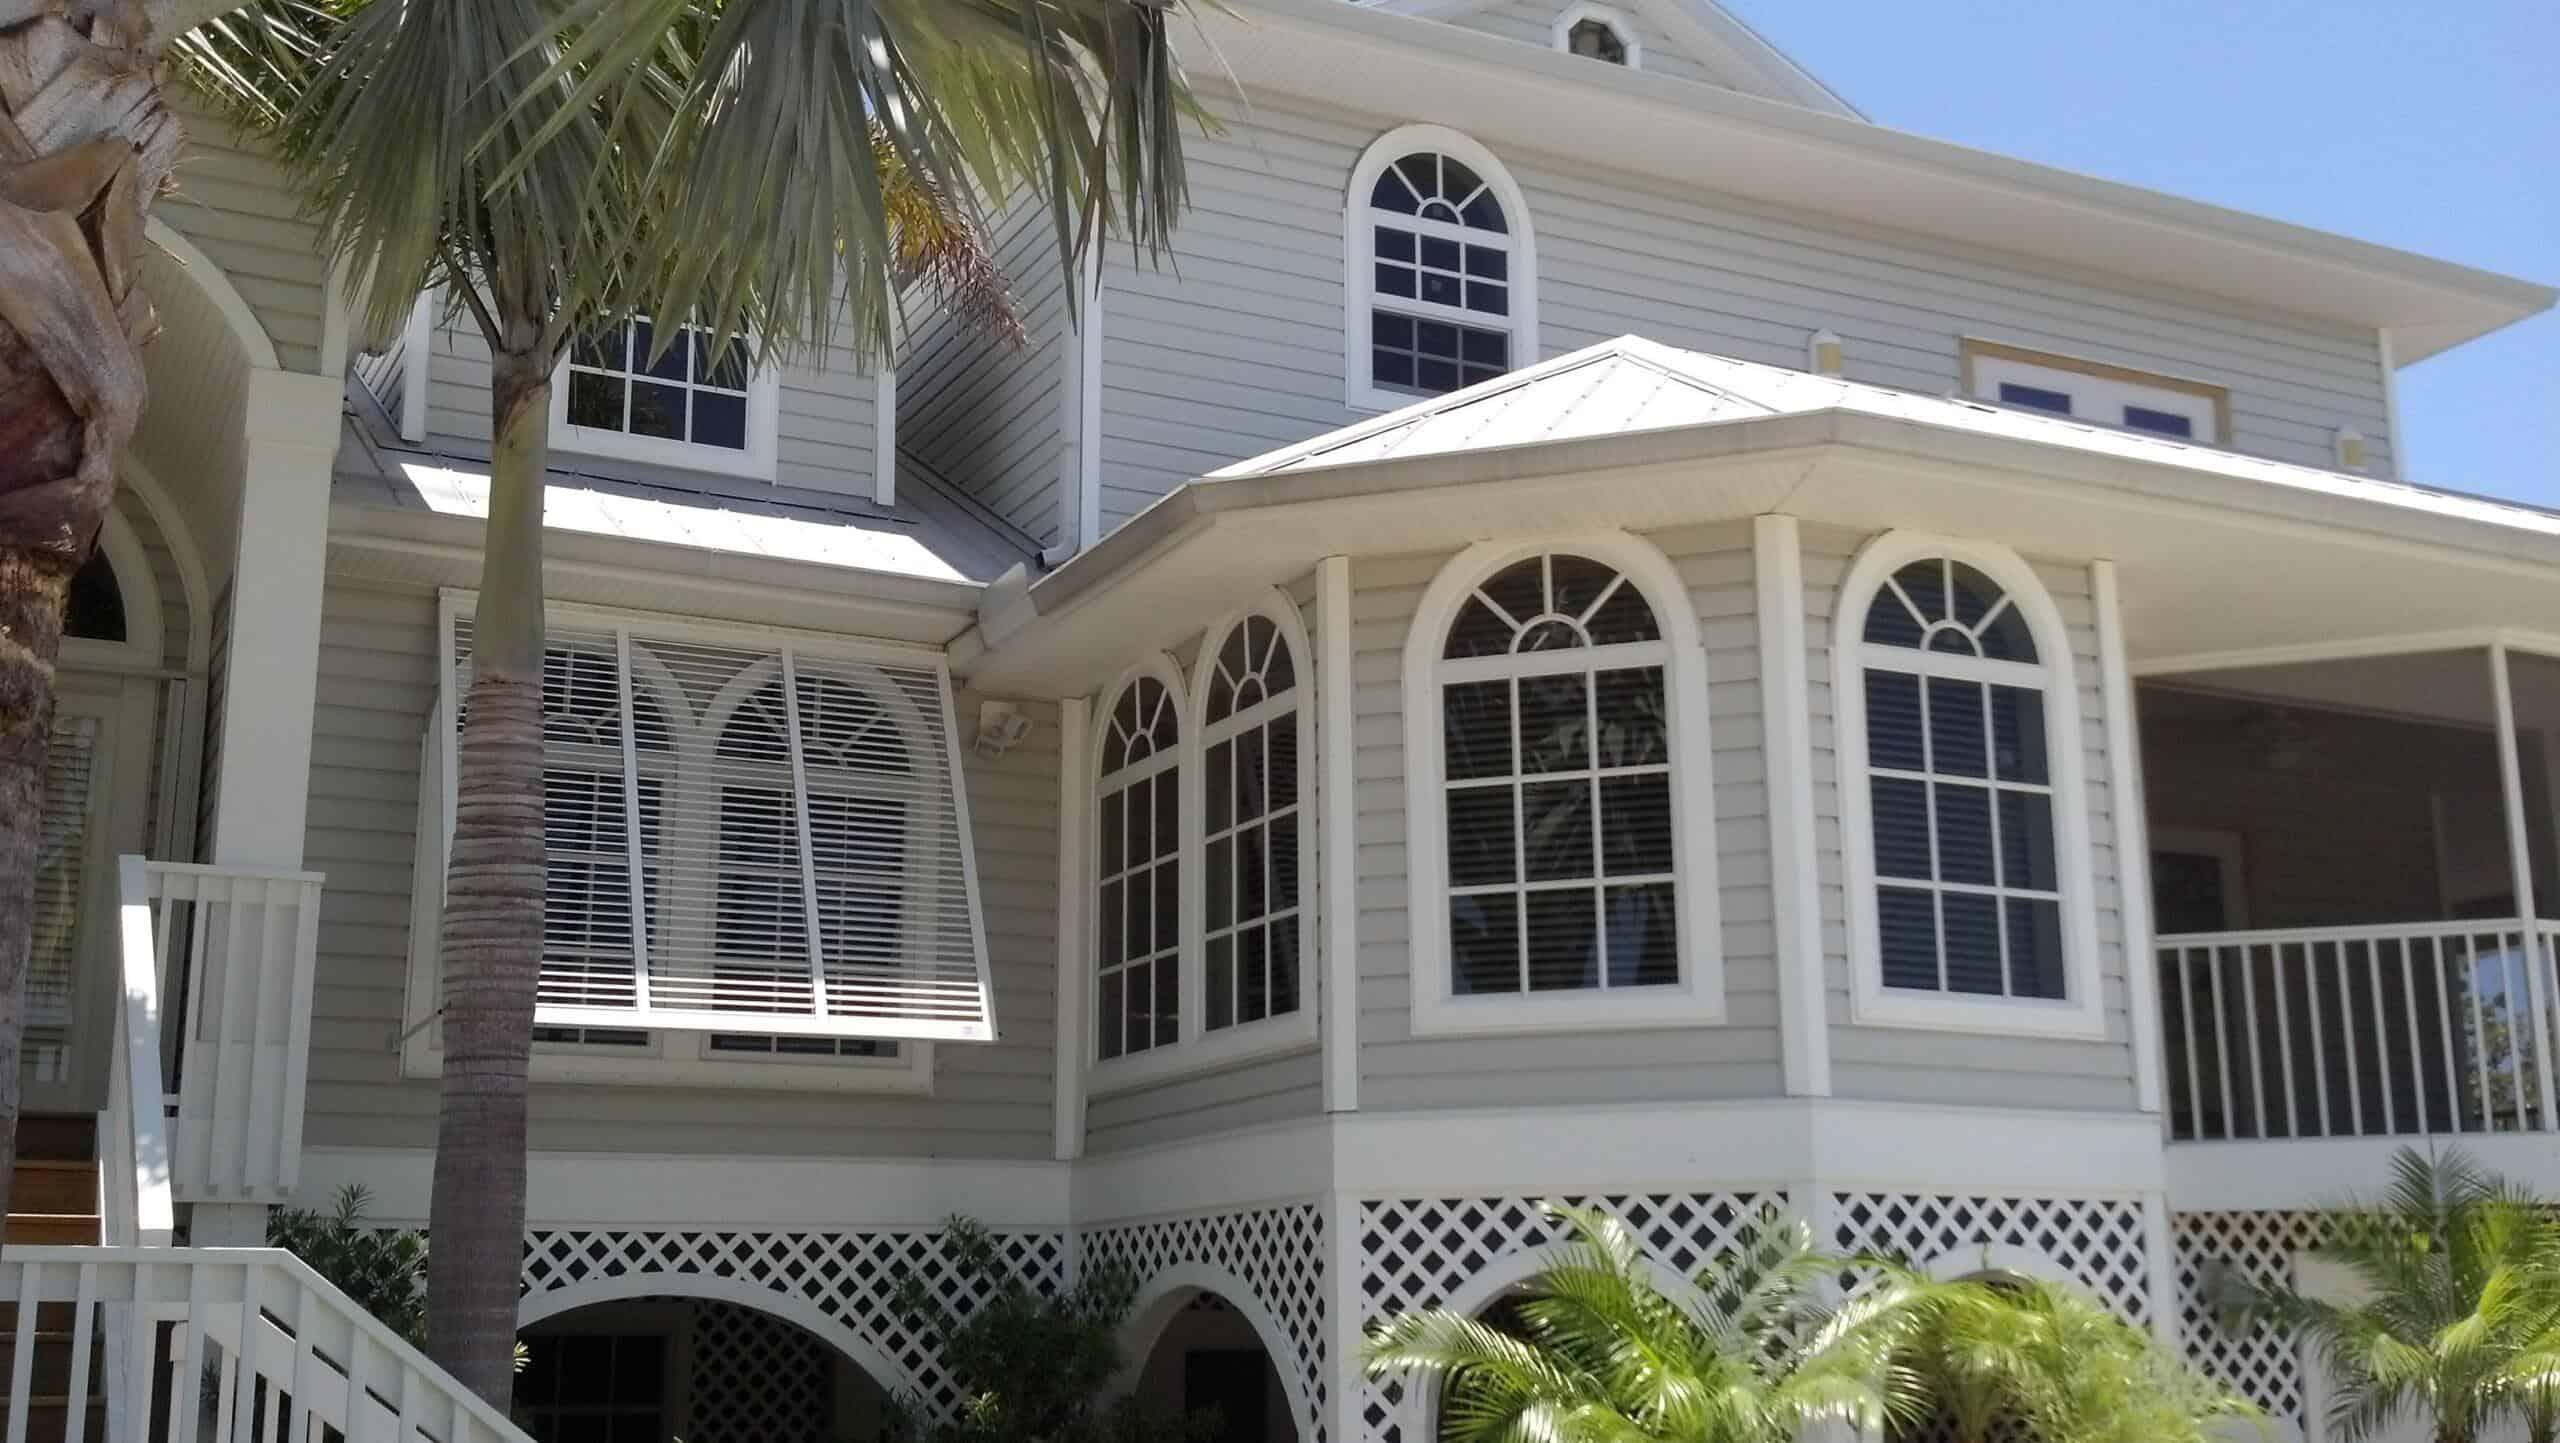 open bahama hurricane shutters on tan house